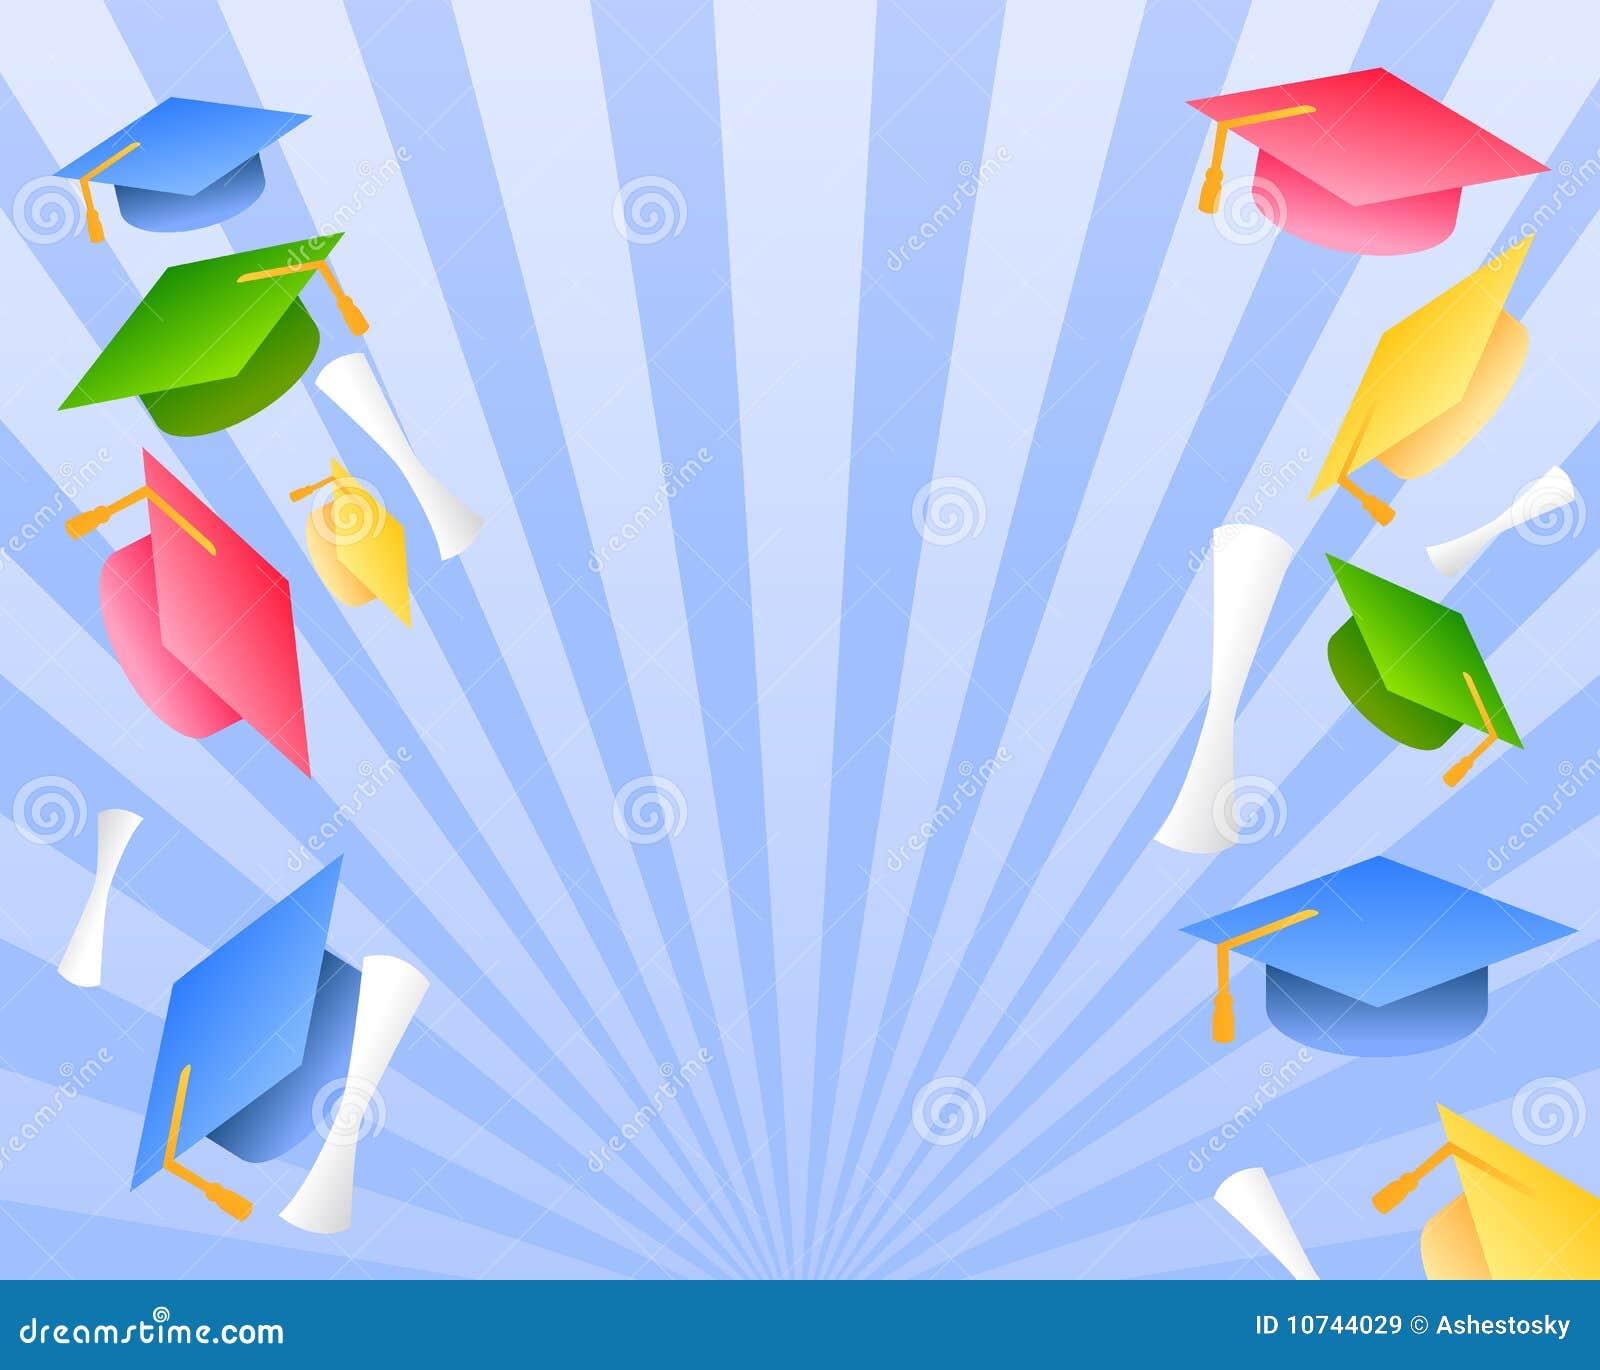 Graduation day greetings stock vector illustration of coming 10744029 graduation day greetings m4hsunfo